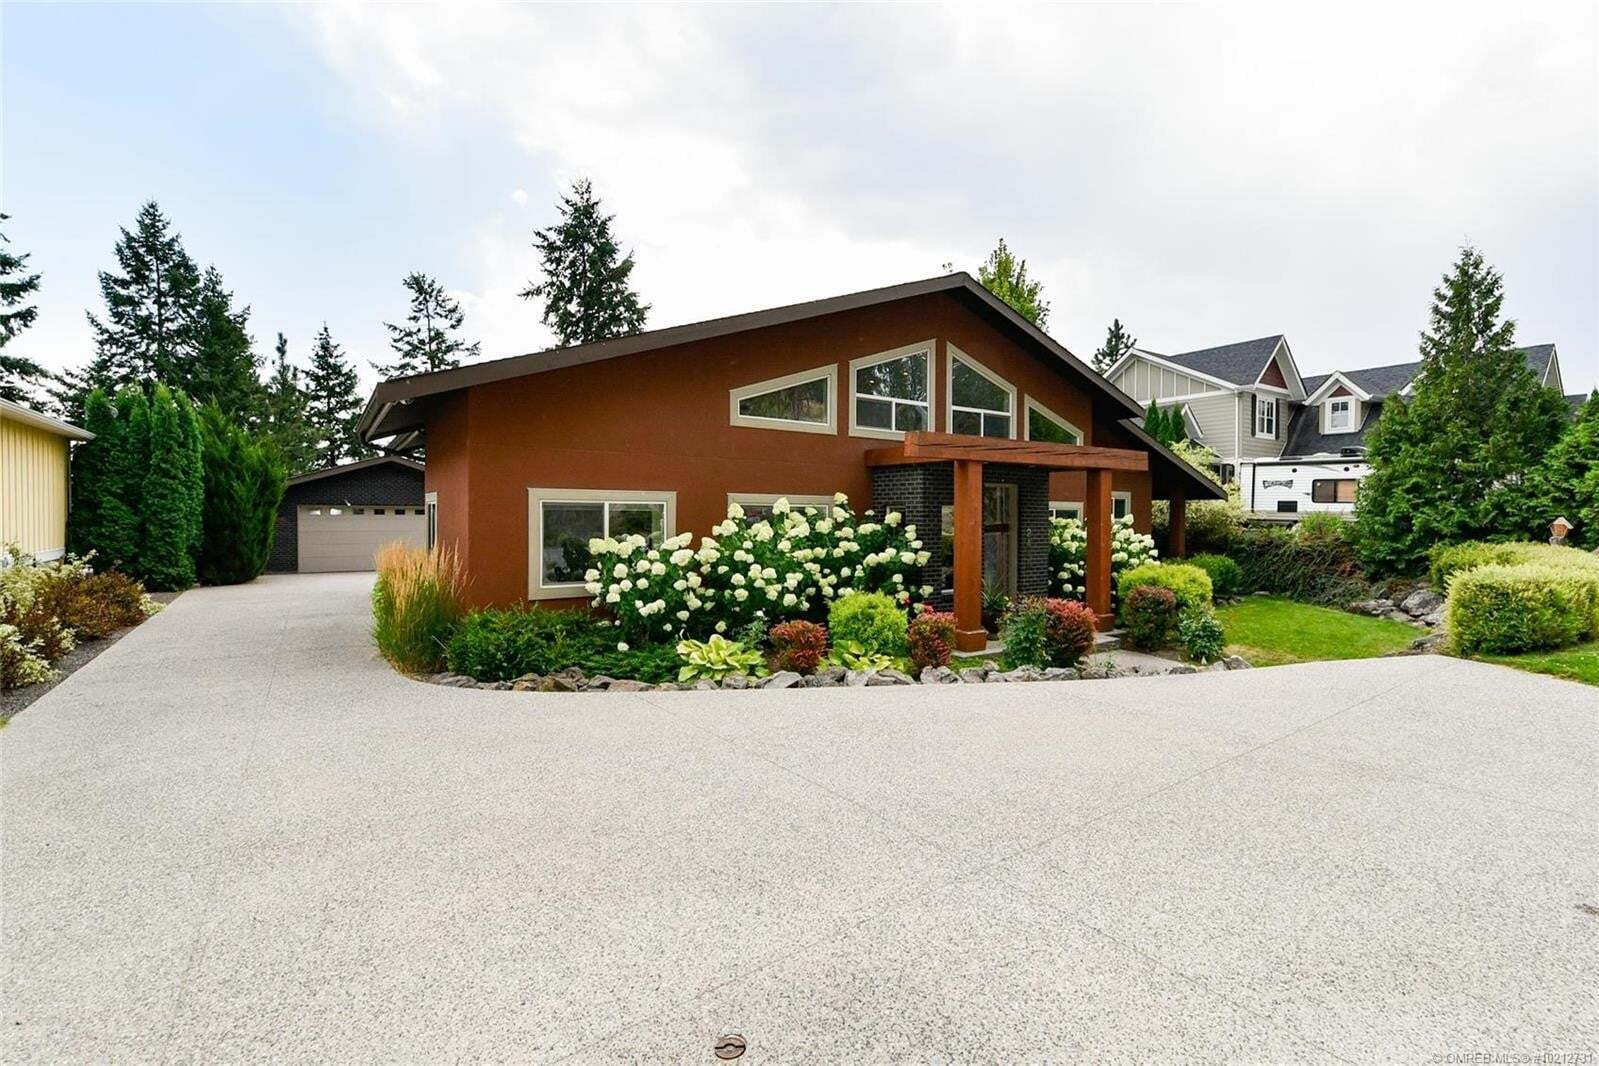 House for sale at 2415 Tallus Ridge Dr West Kelowna British Columbia - MLS: 10212731